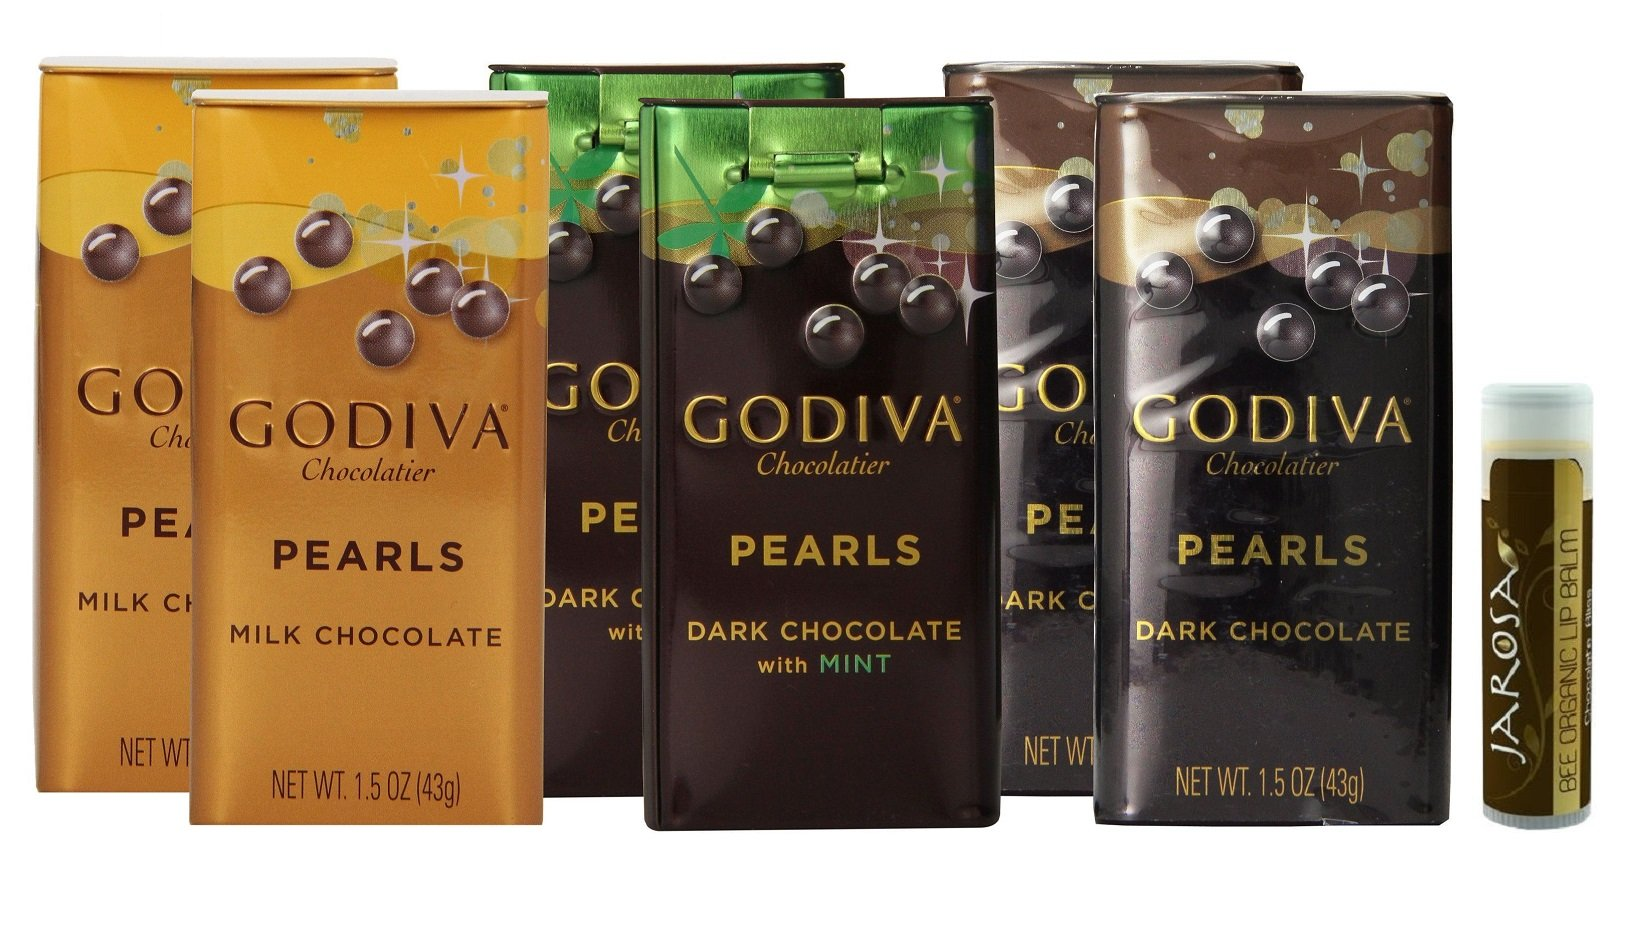 Godiva Pearls Gift Box Set Variety Pack with Dark Chocolate Mint Pearls, Dark Chocolate Pearls & Milk Chocolate Pearls (2 of Each) with a Jarosa Chocolate Bliss Lip Balm